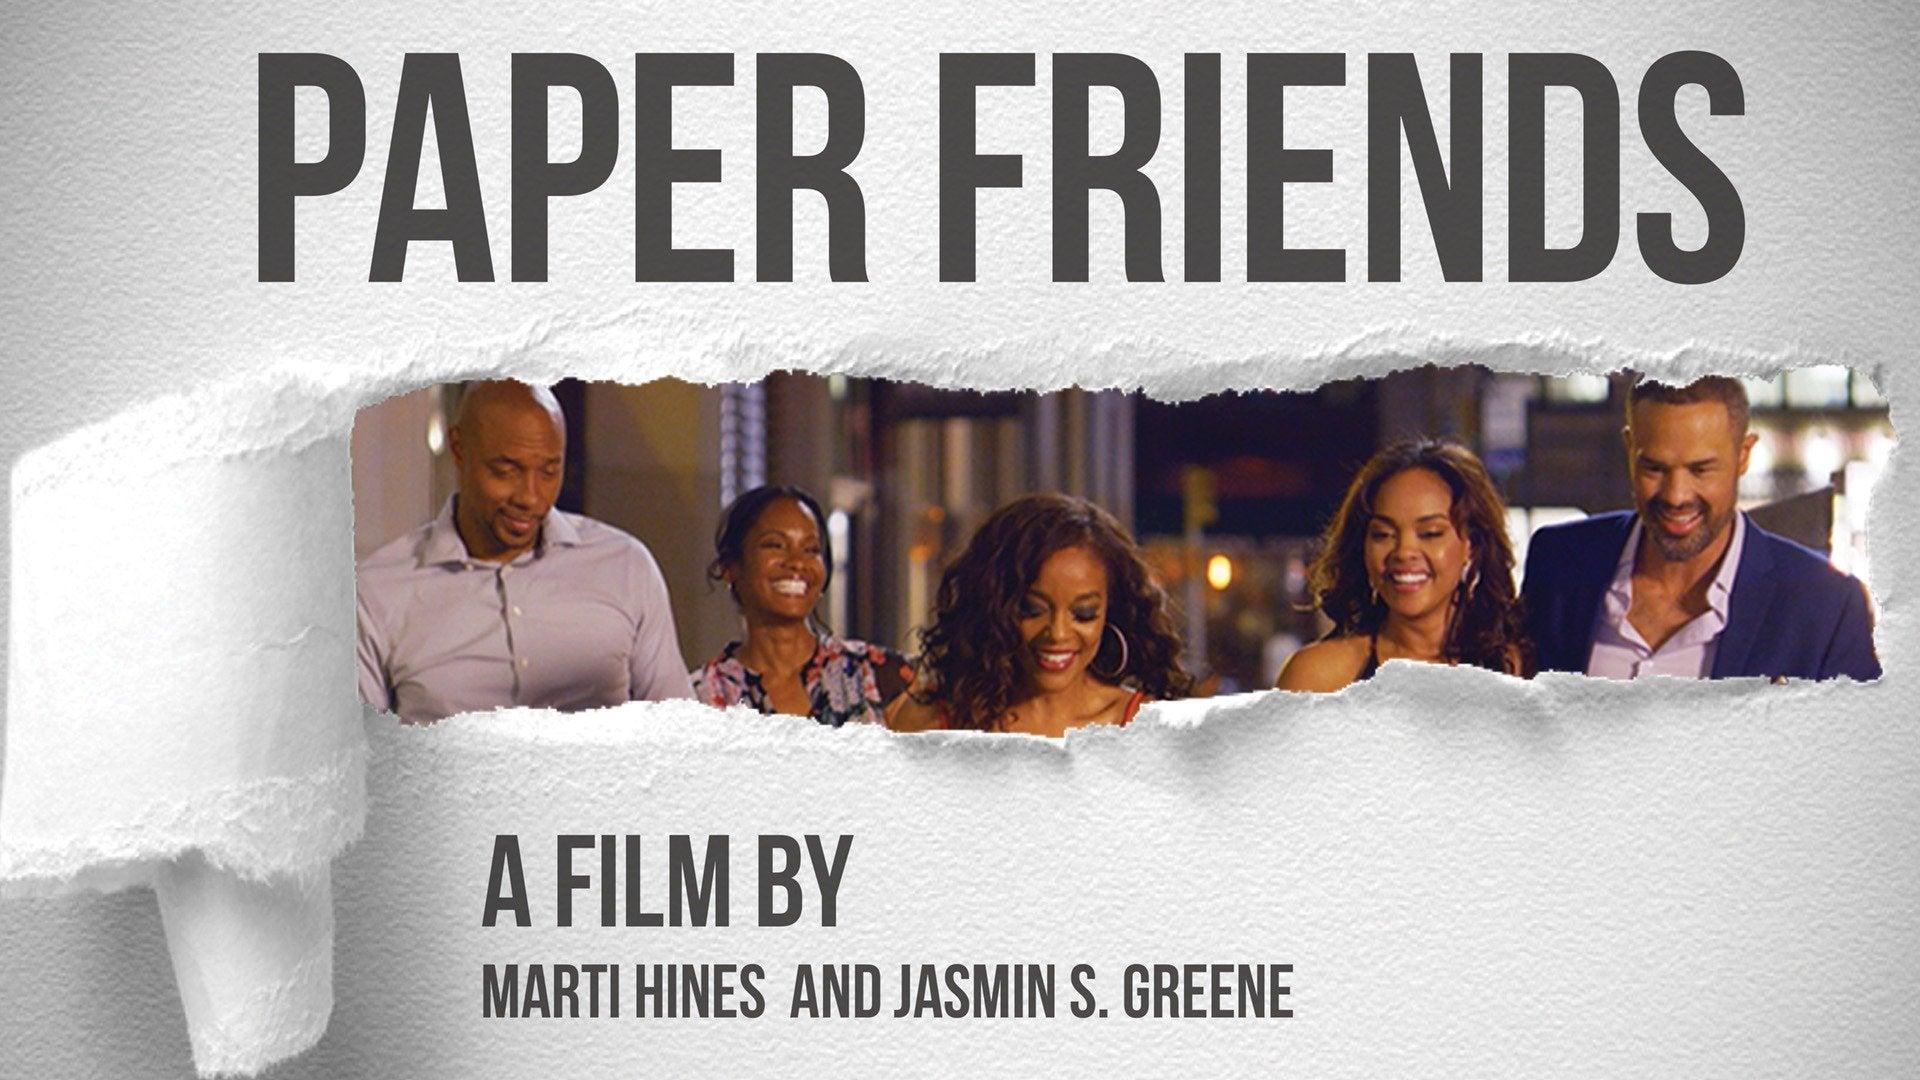 paperfriendsgraphic